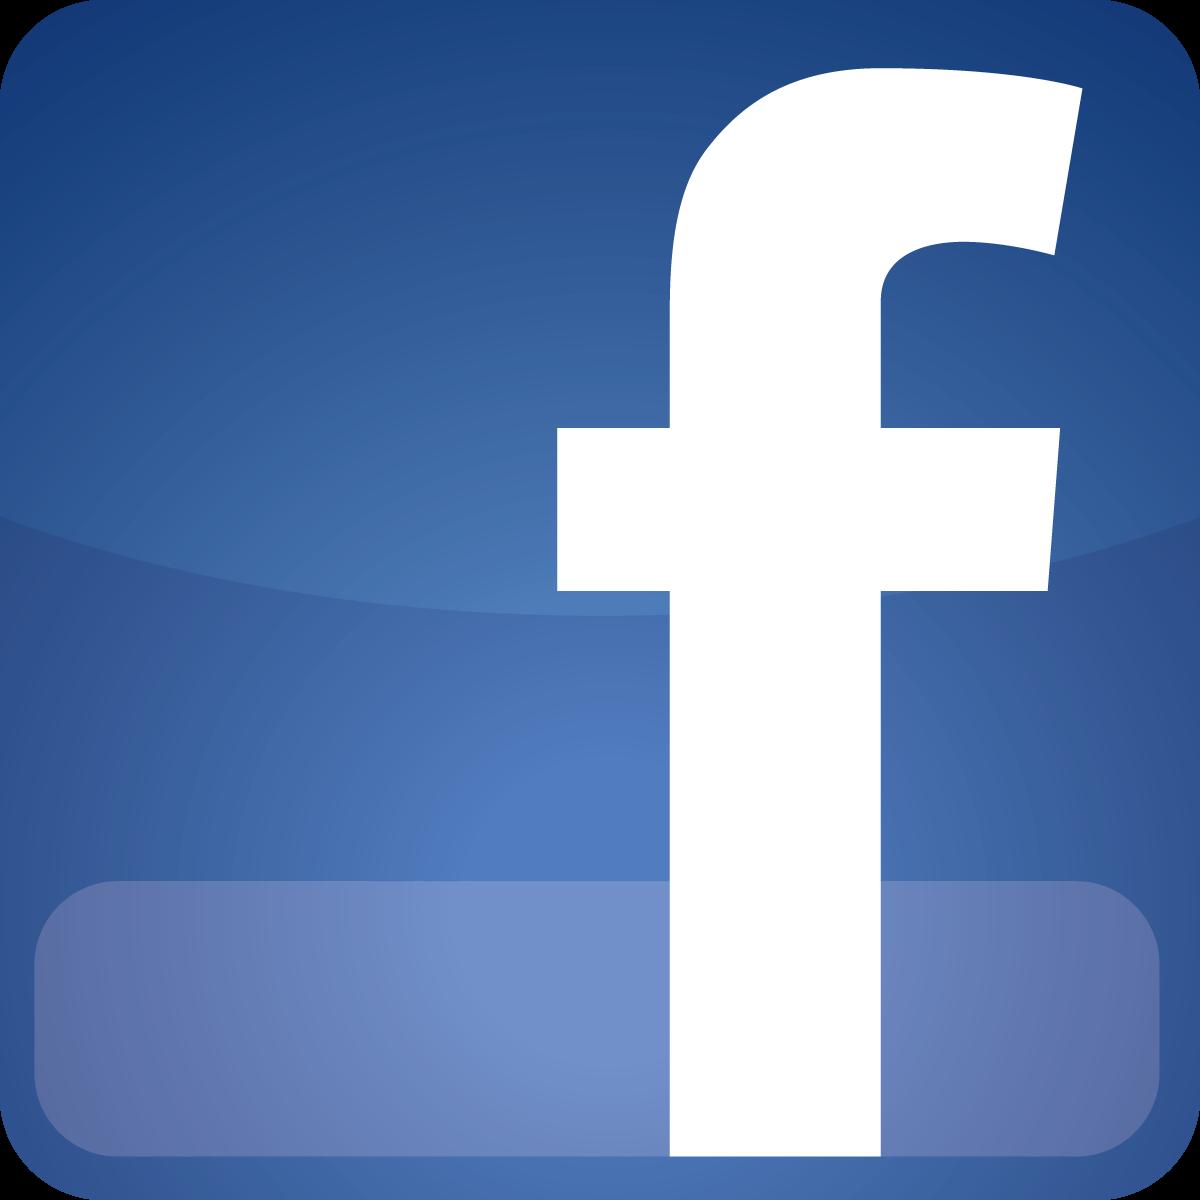 Facebook Logo PNG Images | PNG Cliparts Free Download on ...  |Facebook Like Logo High Resolution